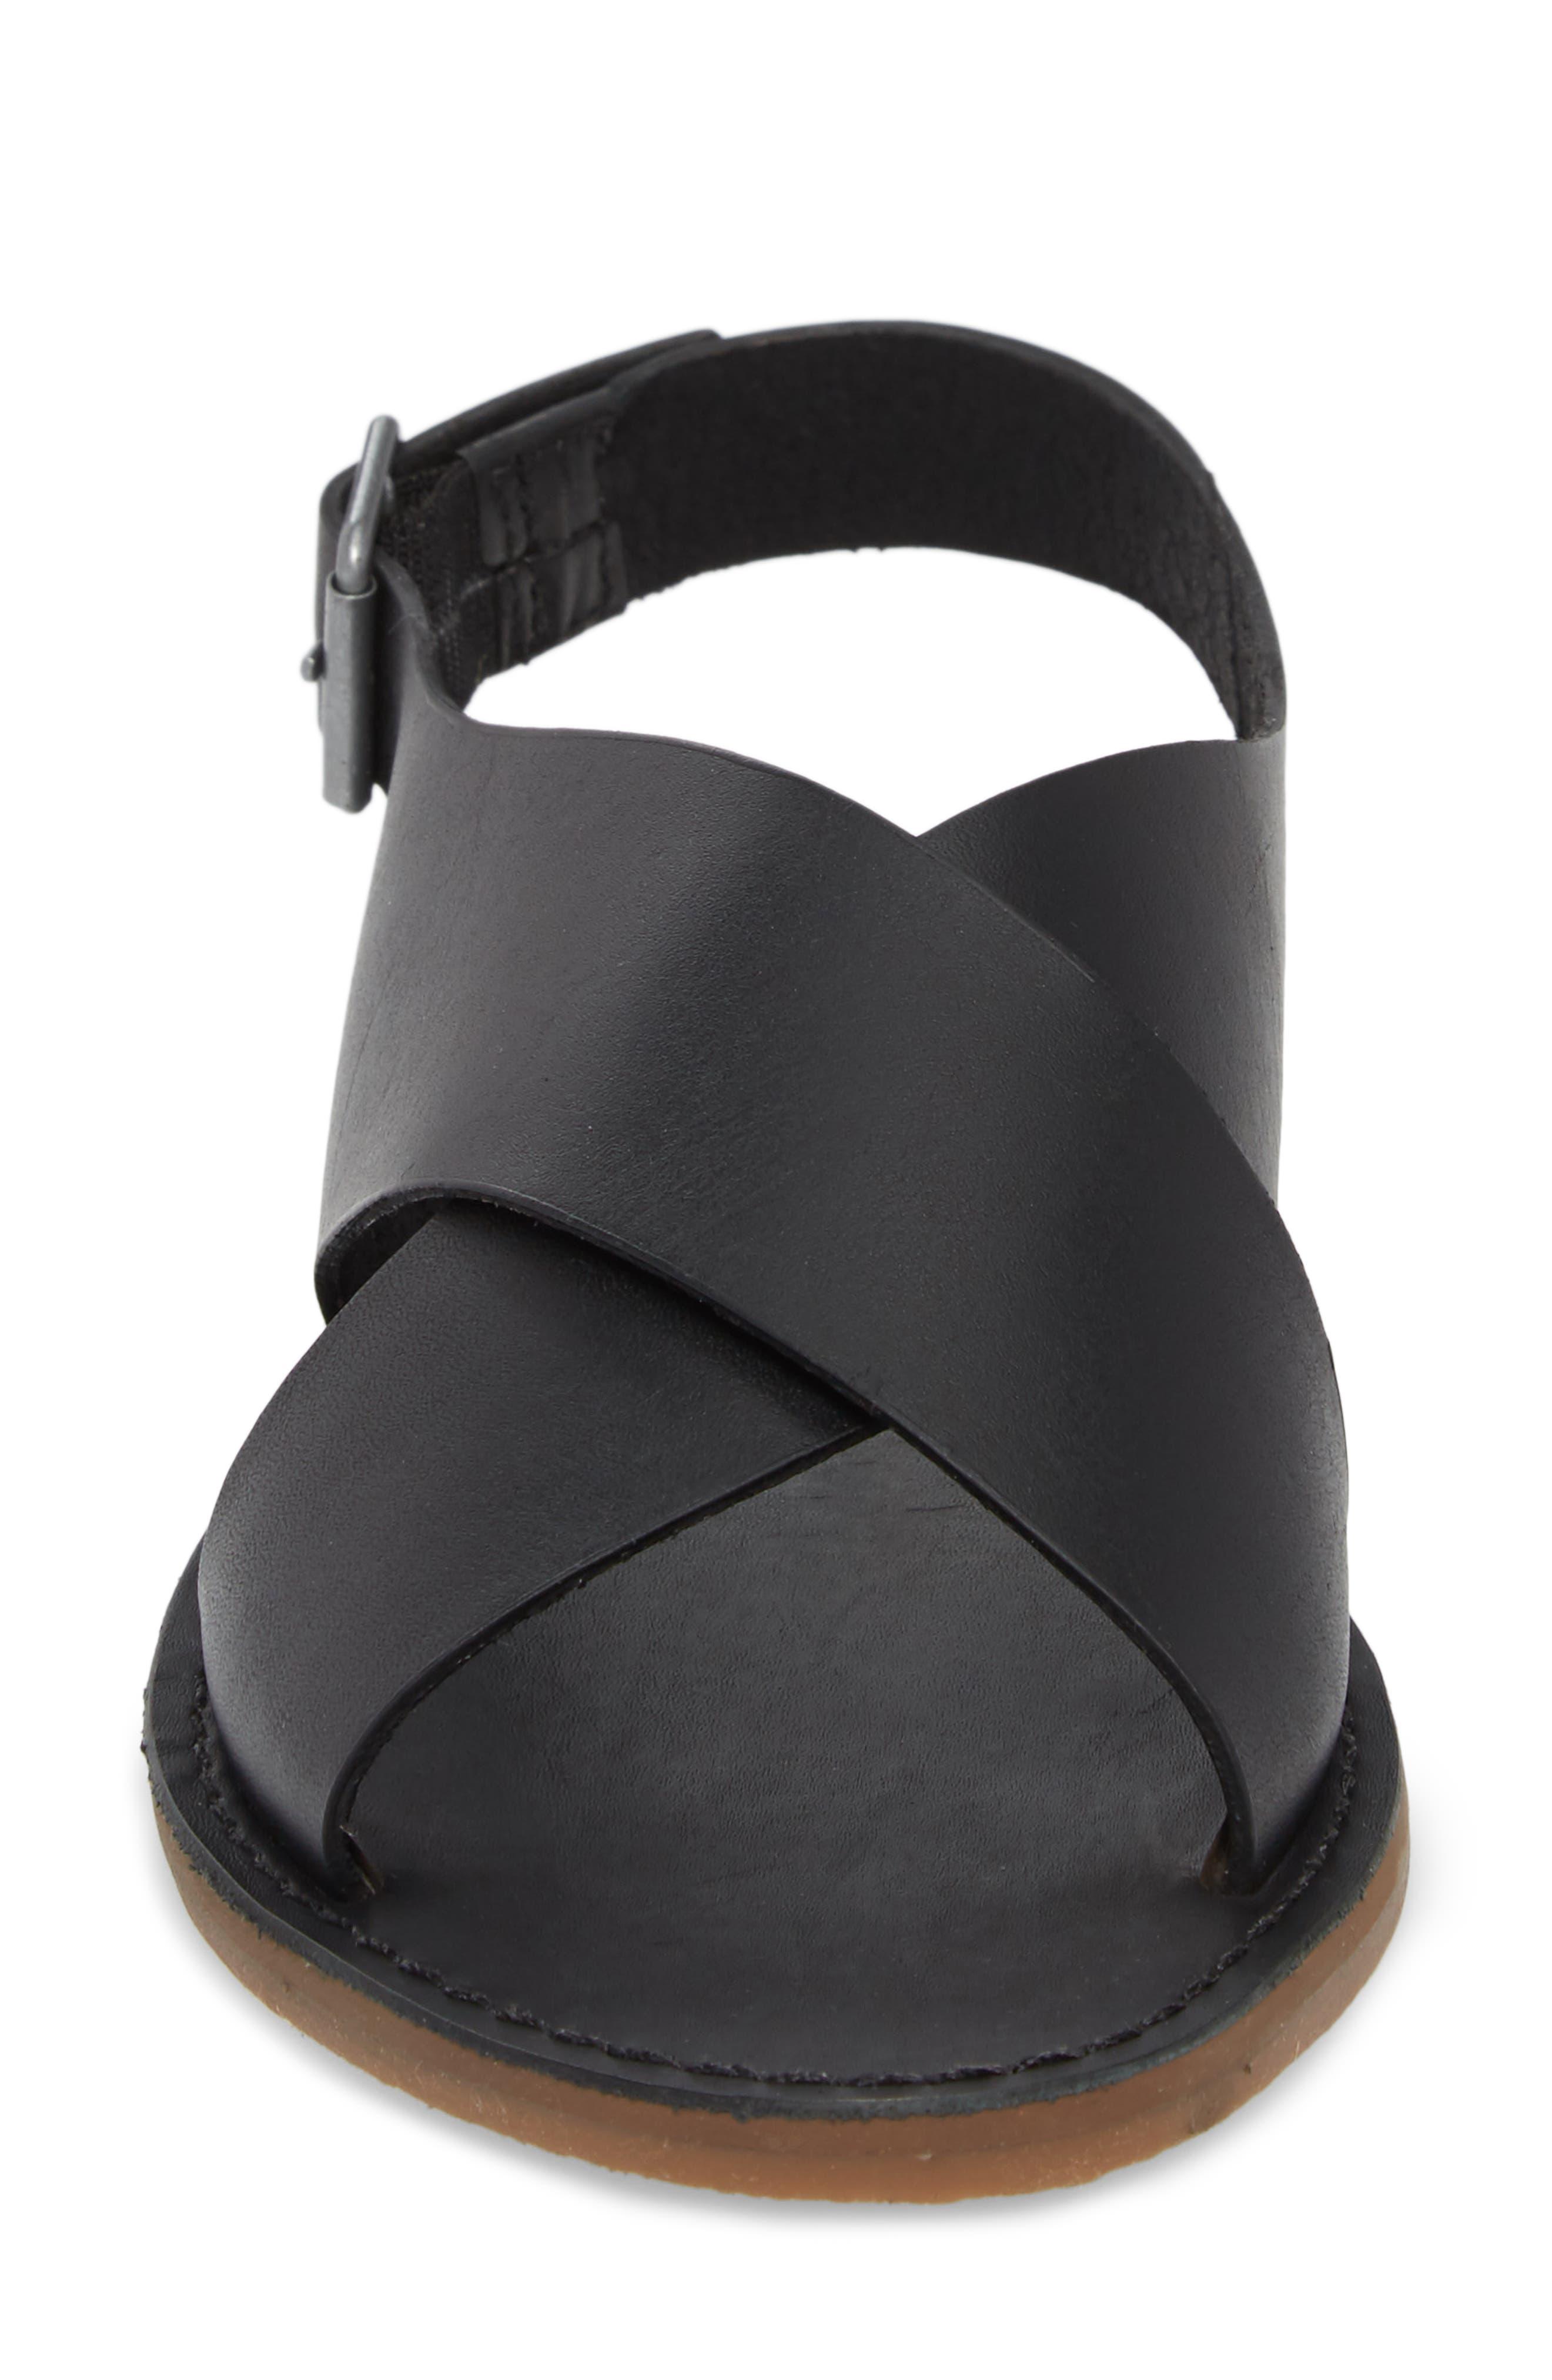 MADEWELL, Boardwalk Flat Sandal, Alternate thumbnail 4, color, TRUE BLACK